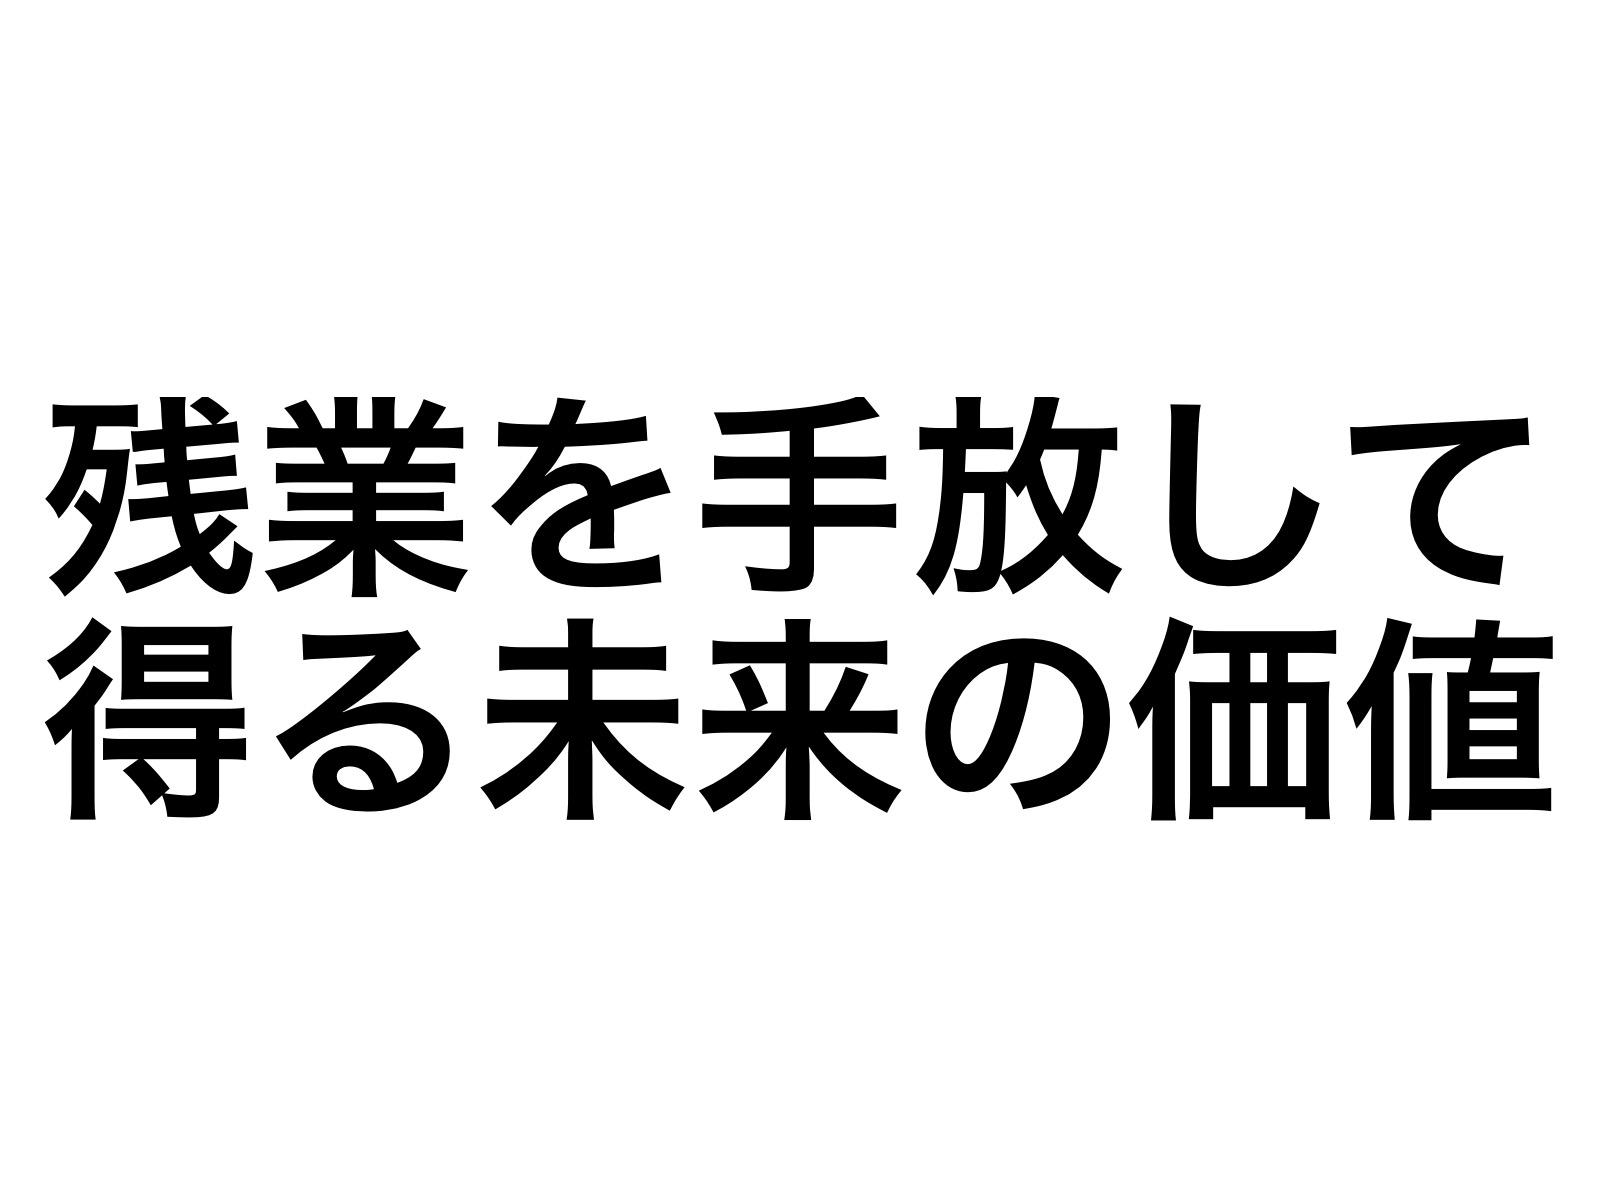 2017 03 02 18 52 21